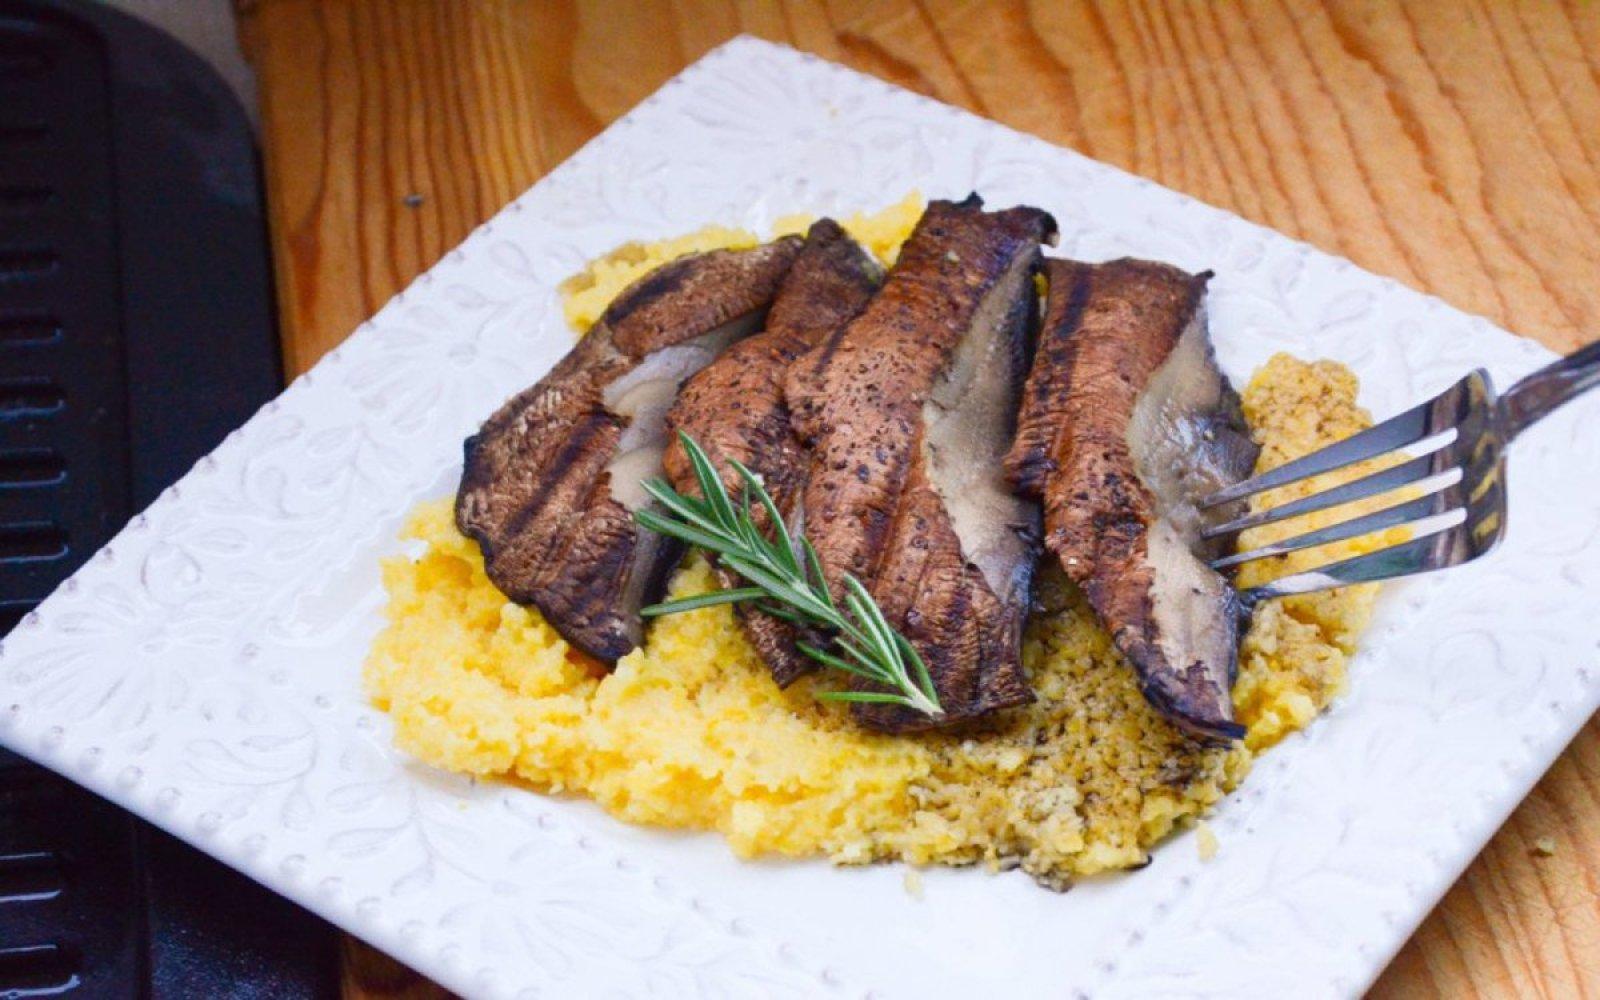 Portobello Mushroom Steaks With Cheesy Rosemary Polenta [Vegan, Gluten-Free]